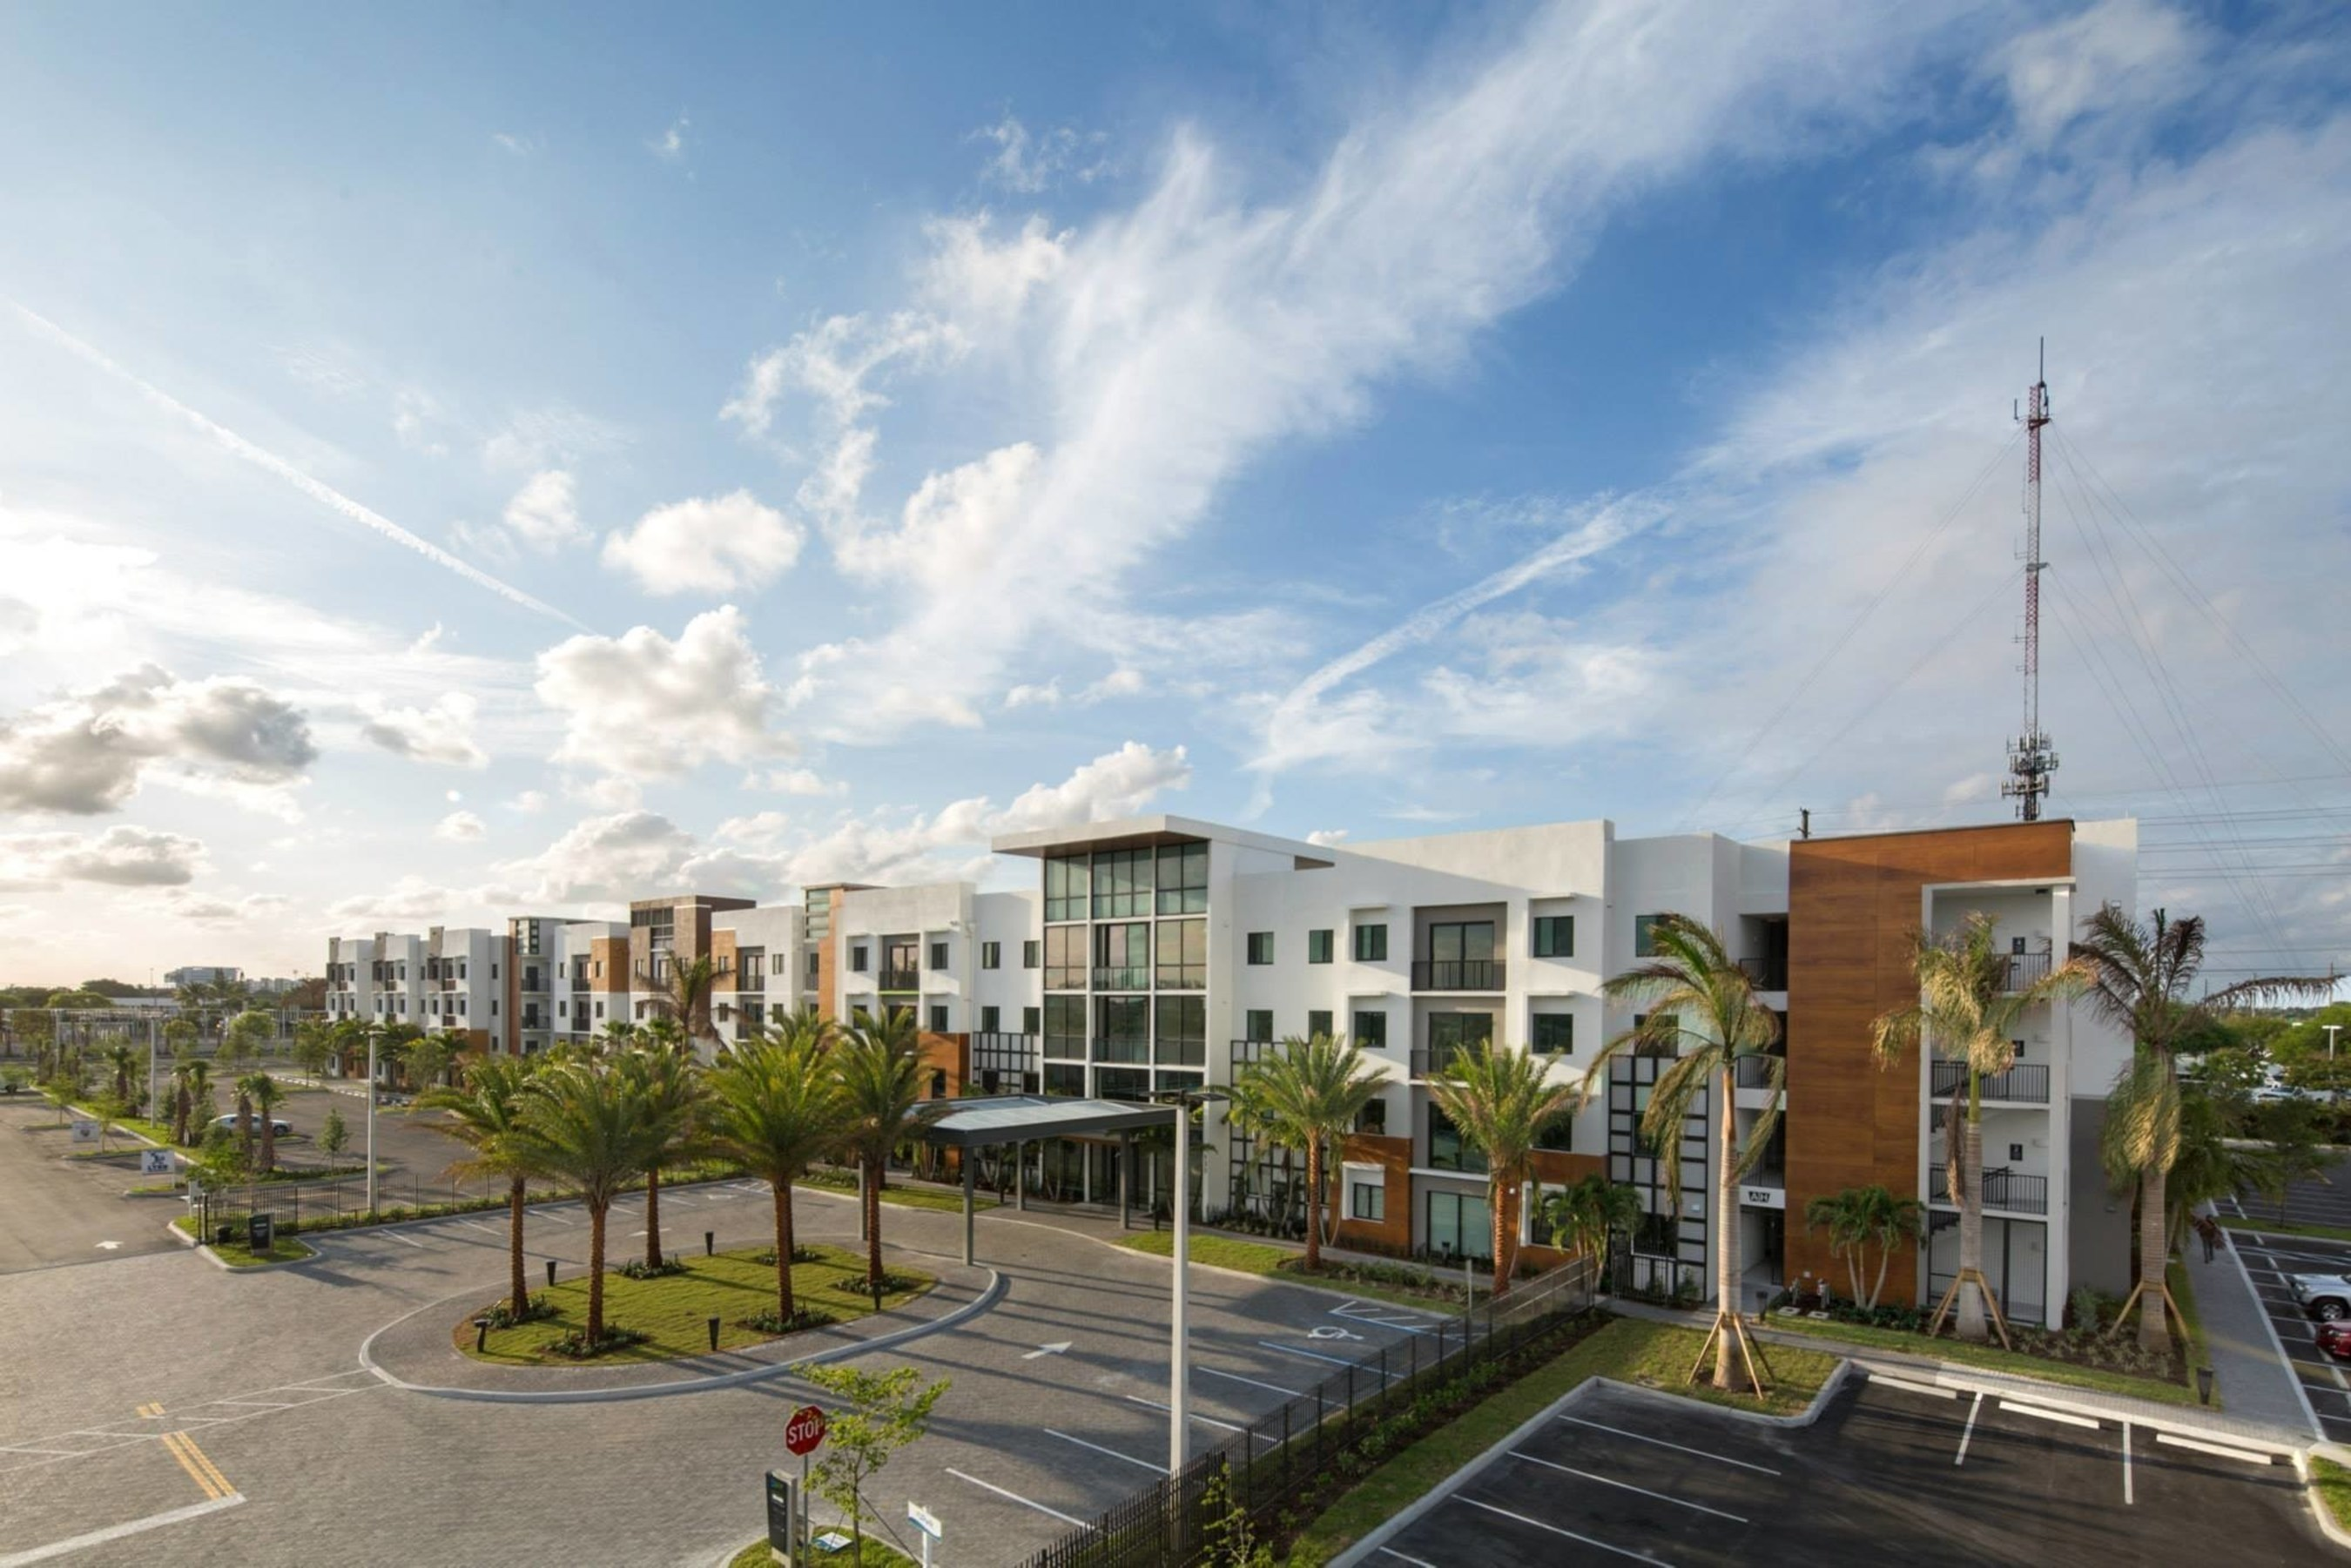 Preiss Company Enters Joint Venture in Boca Raton, Florida